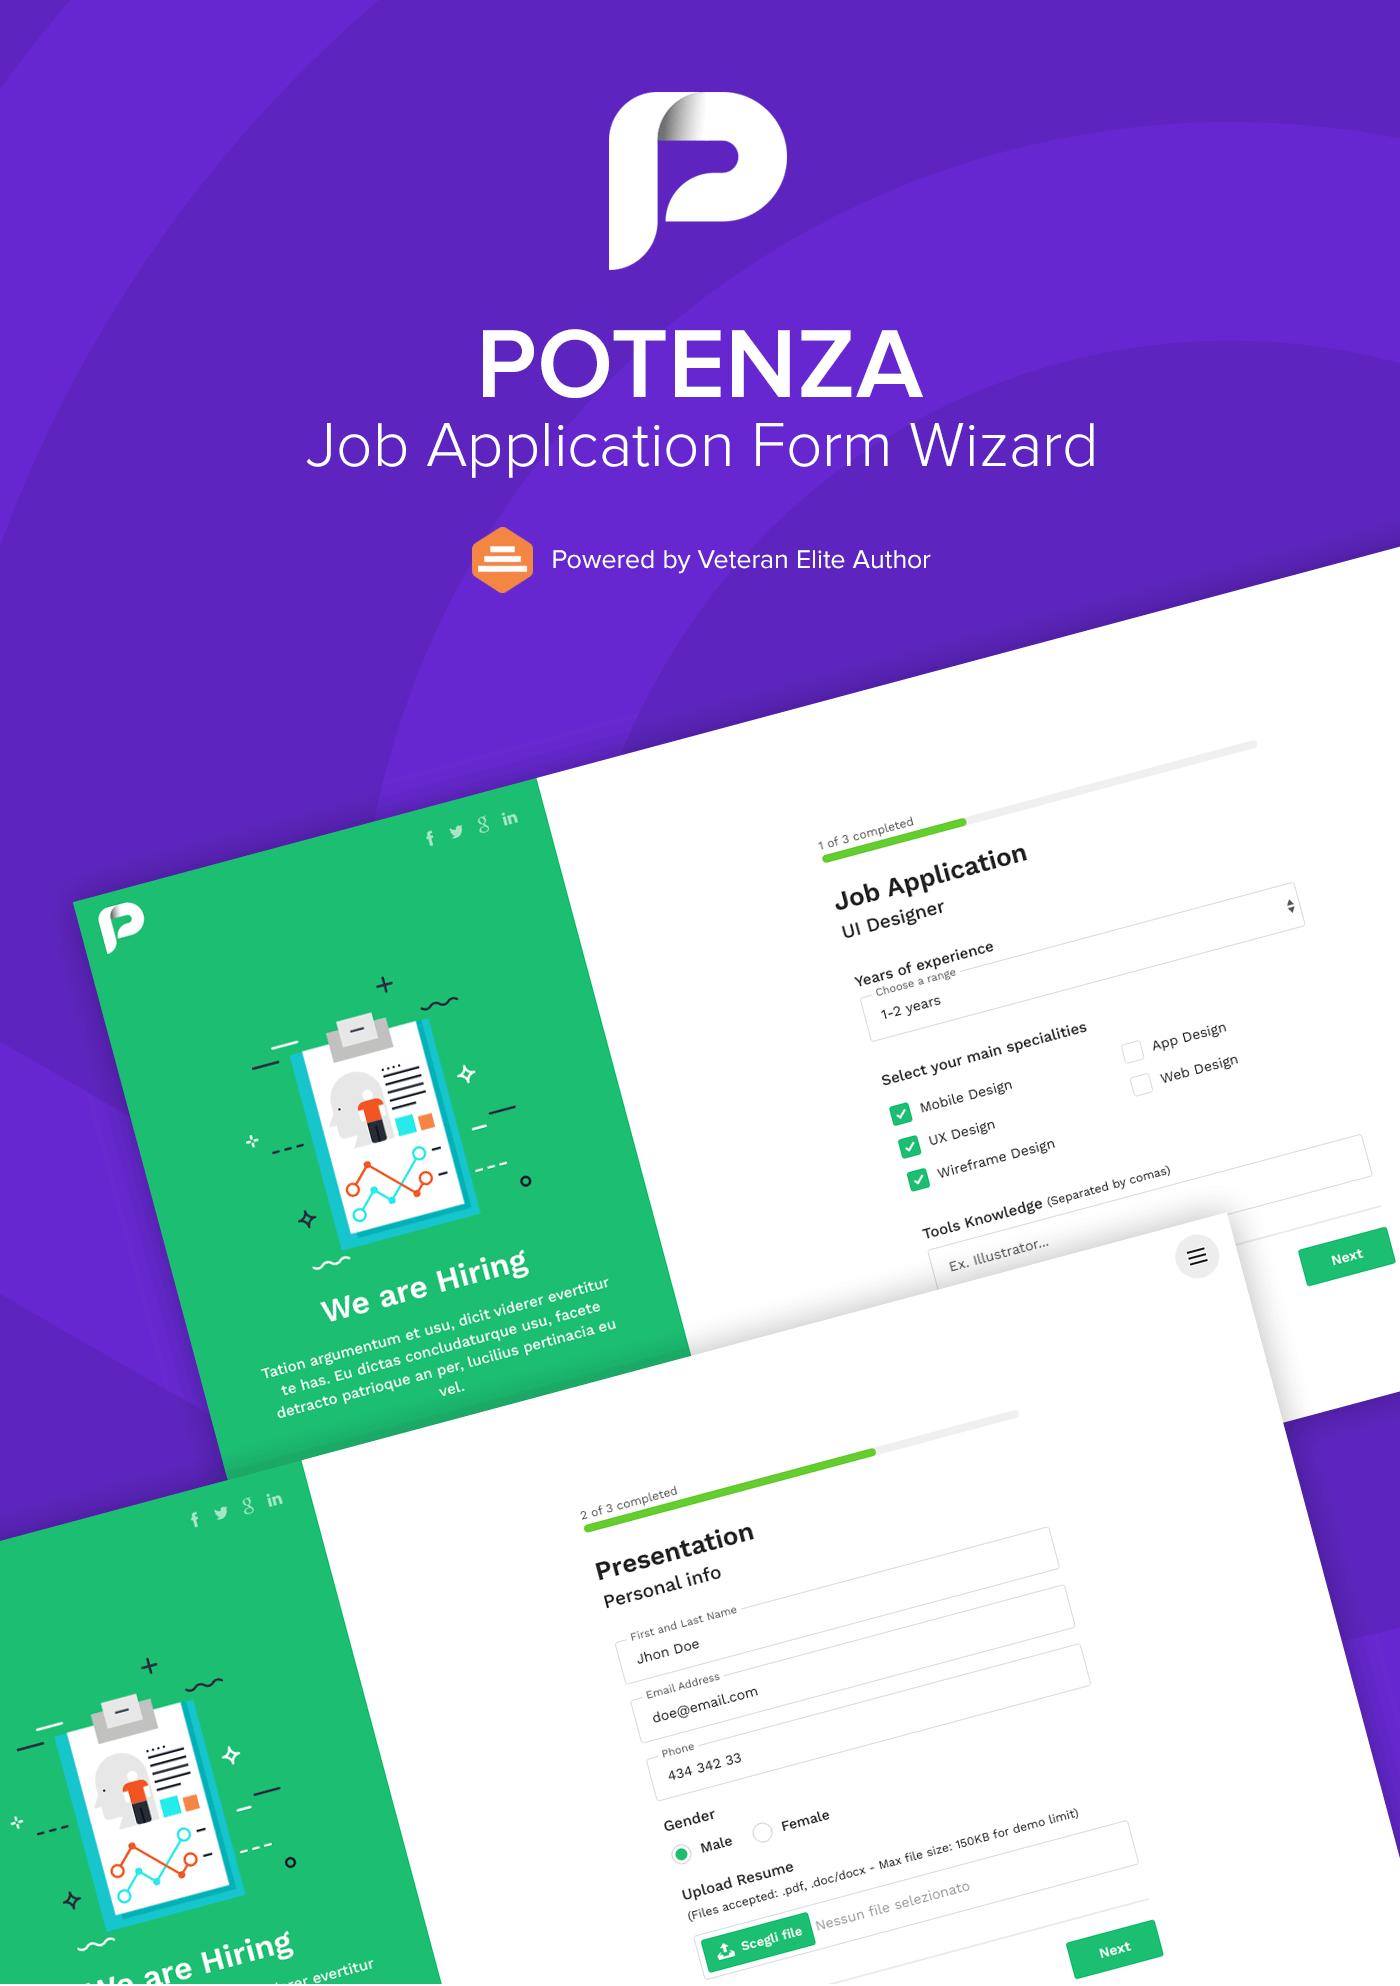 Job Application Form Wizard